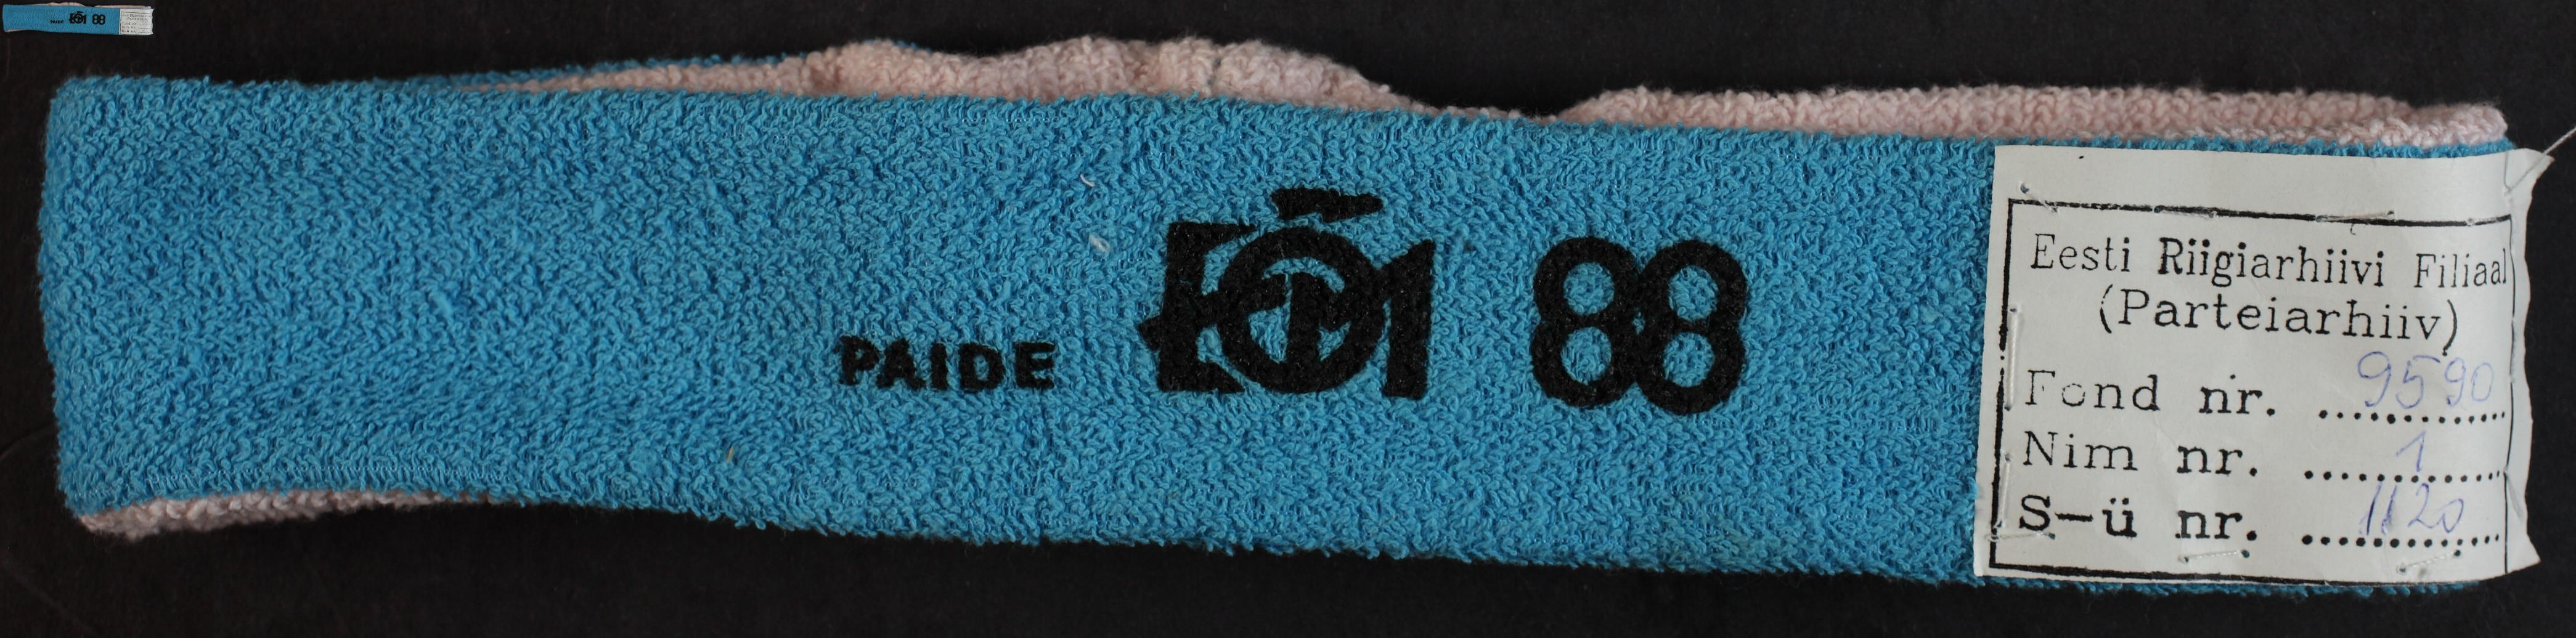 Maleva peapael. Paide 1988 / Secondary School Students' Building Brigade headband, Paide 1988